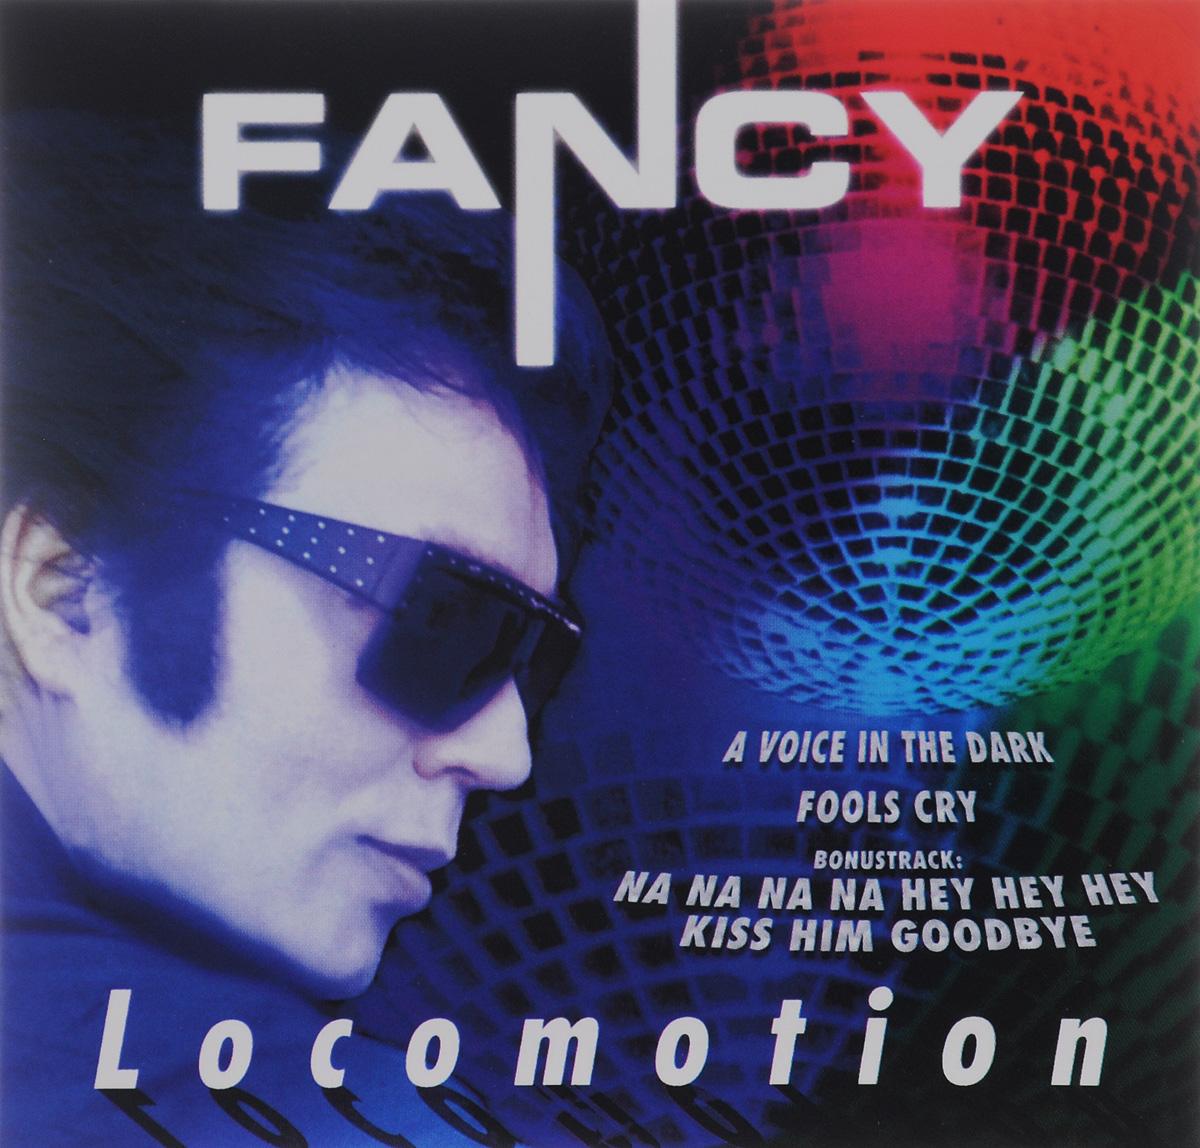 Fancy. Locomotion